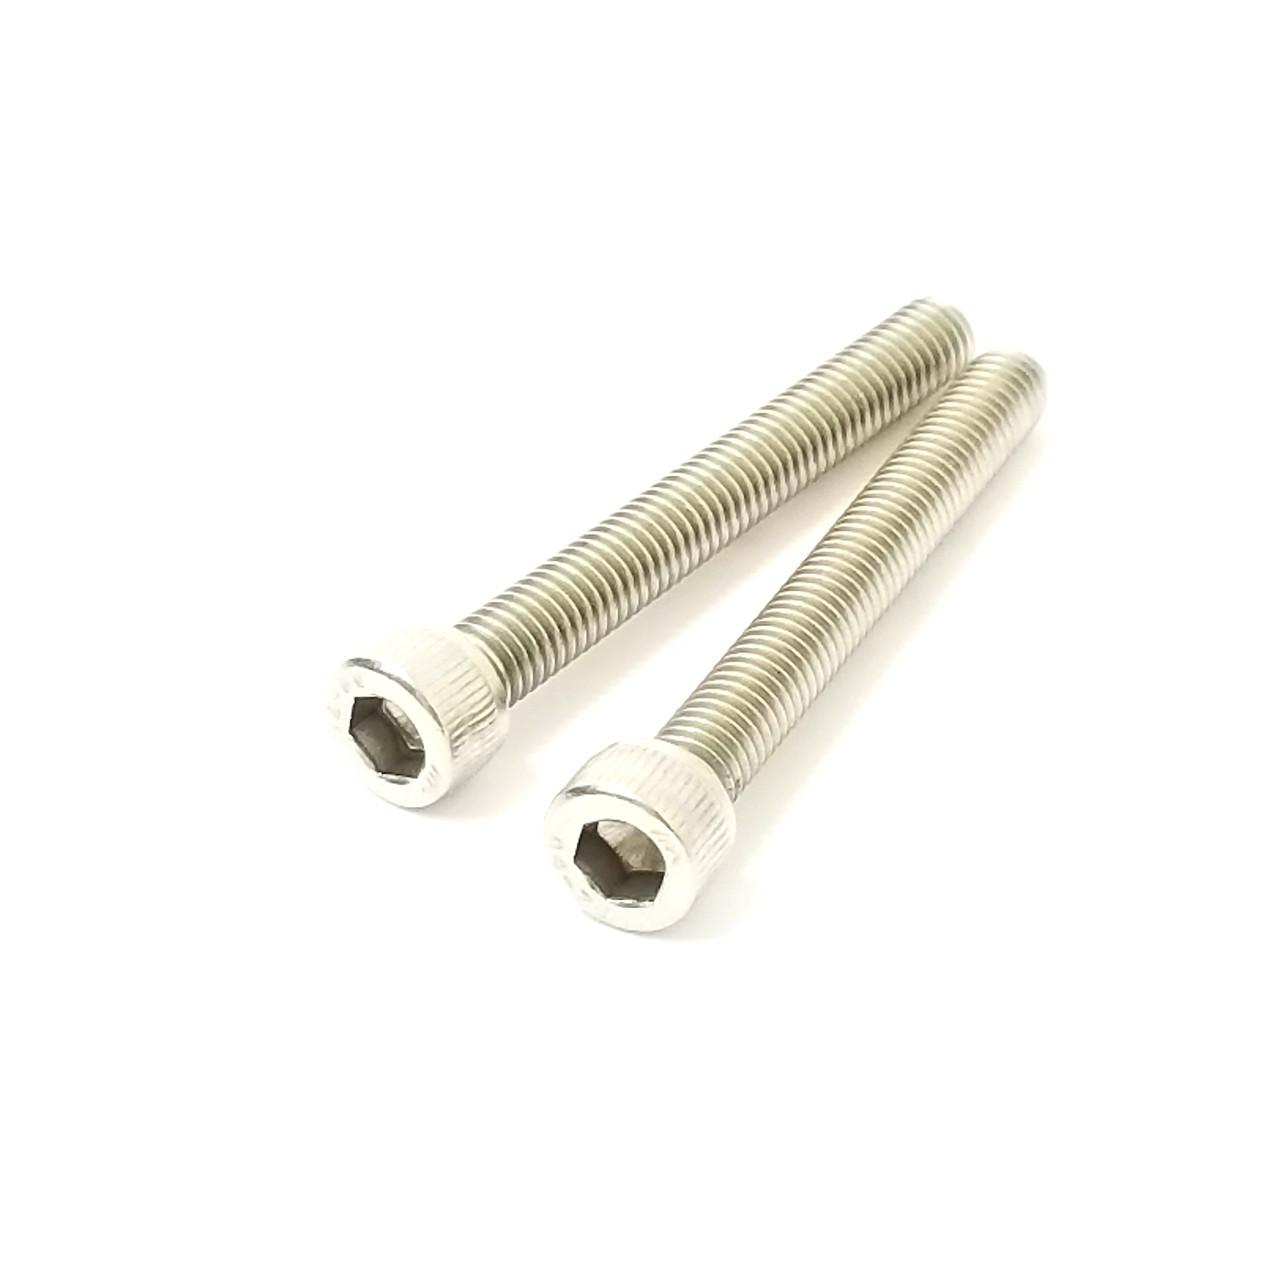 SHB1316 Socket head bolt 316 Stainless